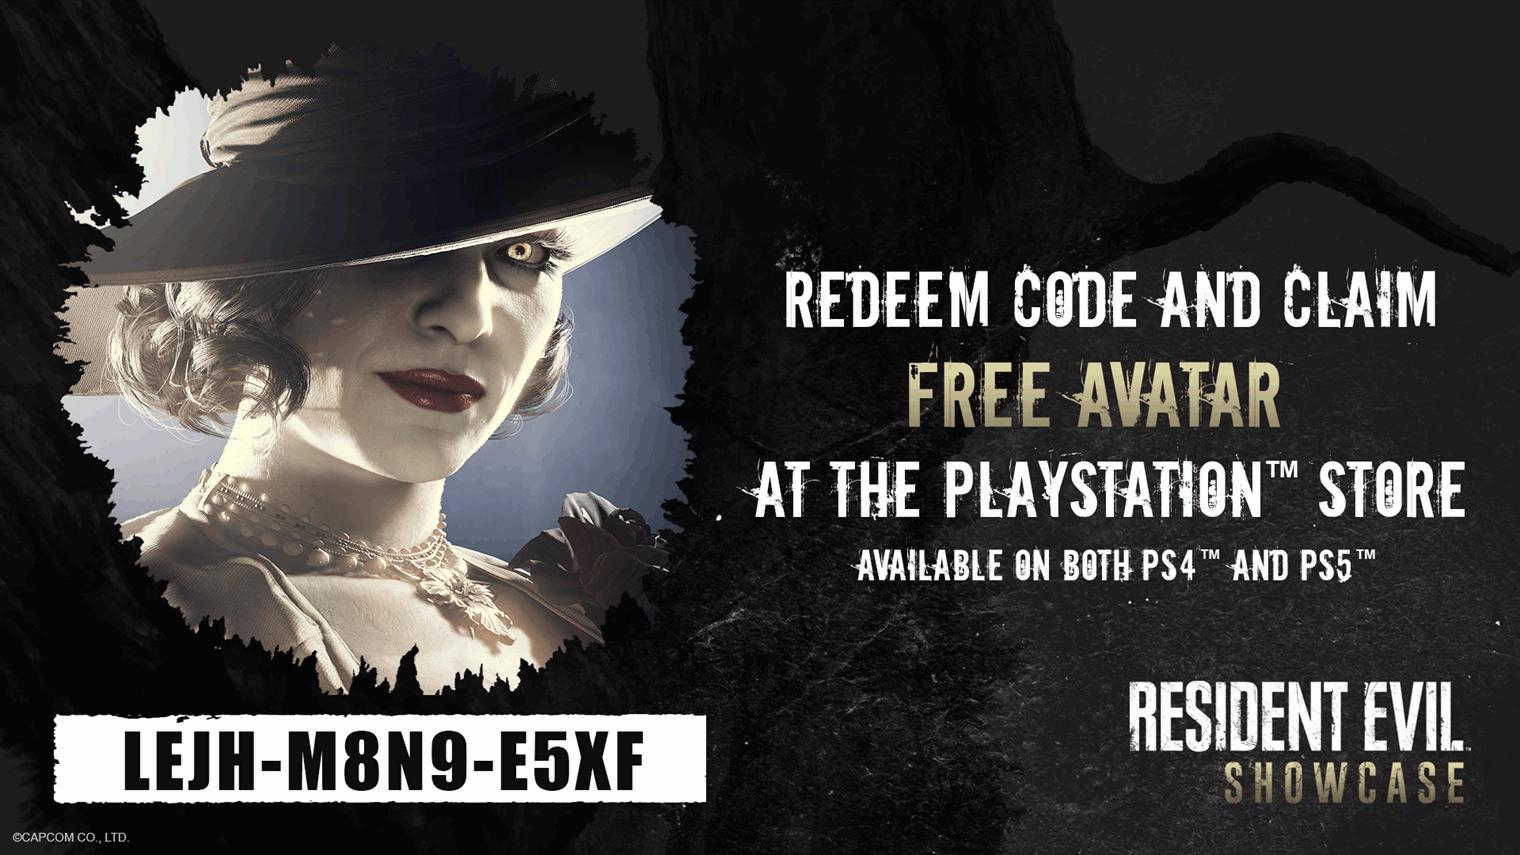 Resident Evil village PSN avatar code PS4 PS5